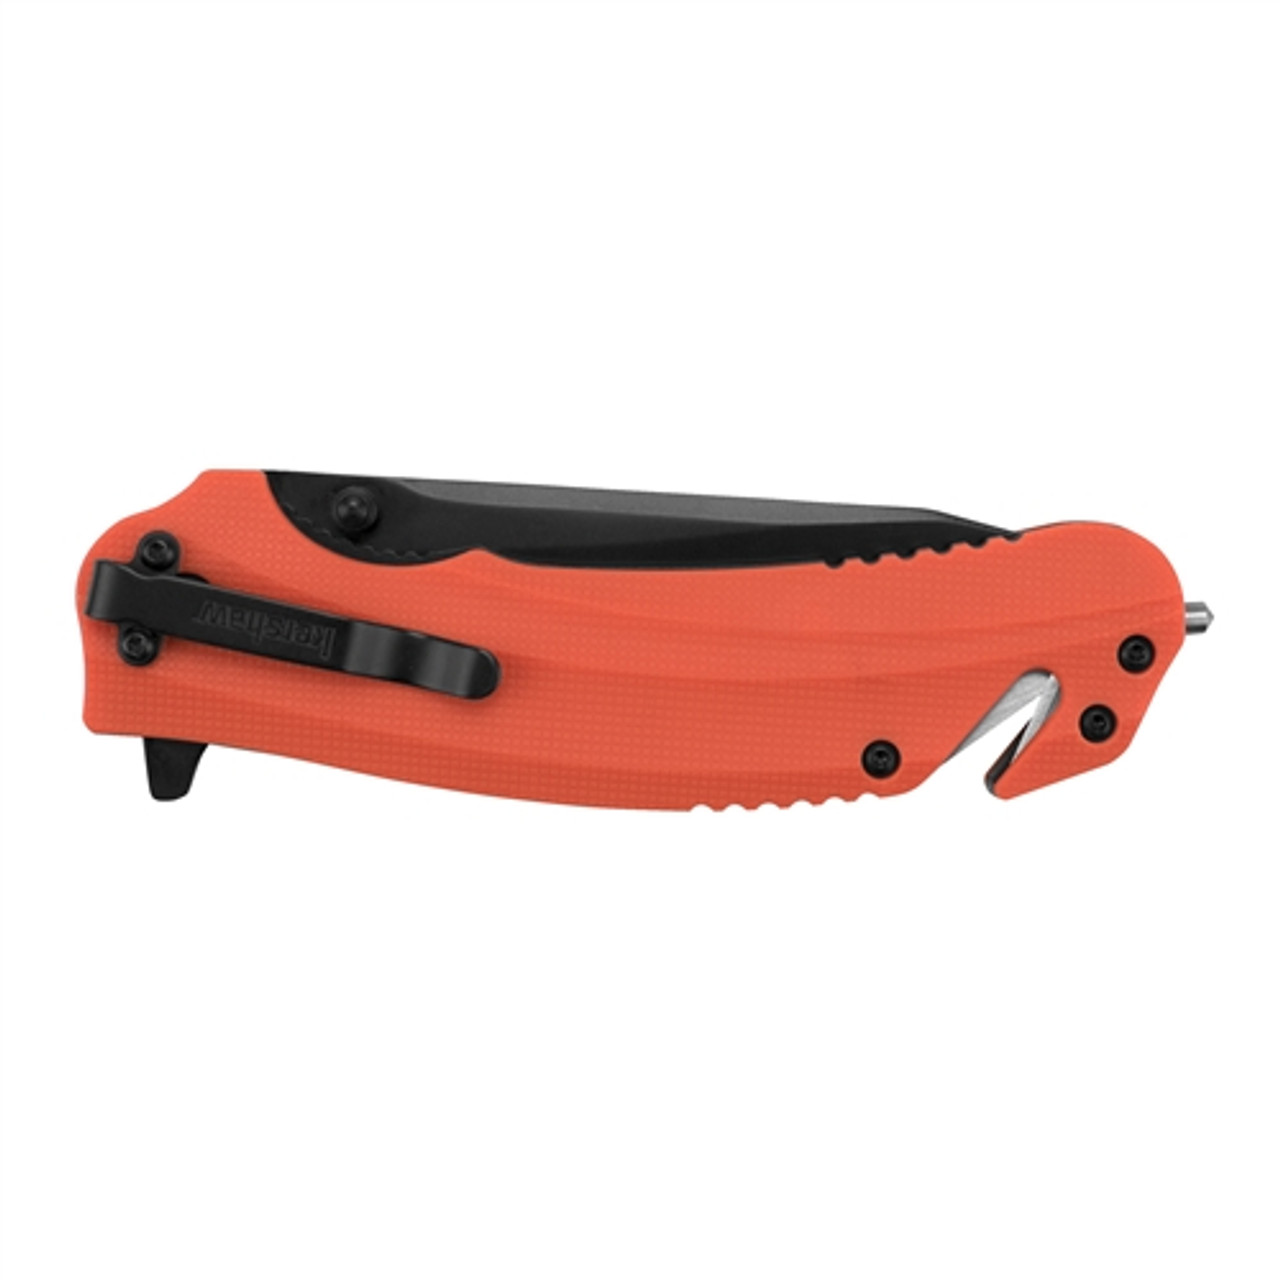 Kershaw 8650 Orange Barricade Rescue Spring Assist Knife, Black Blade